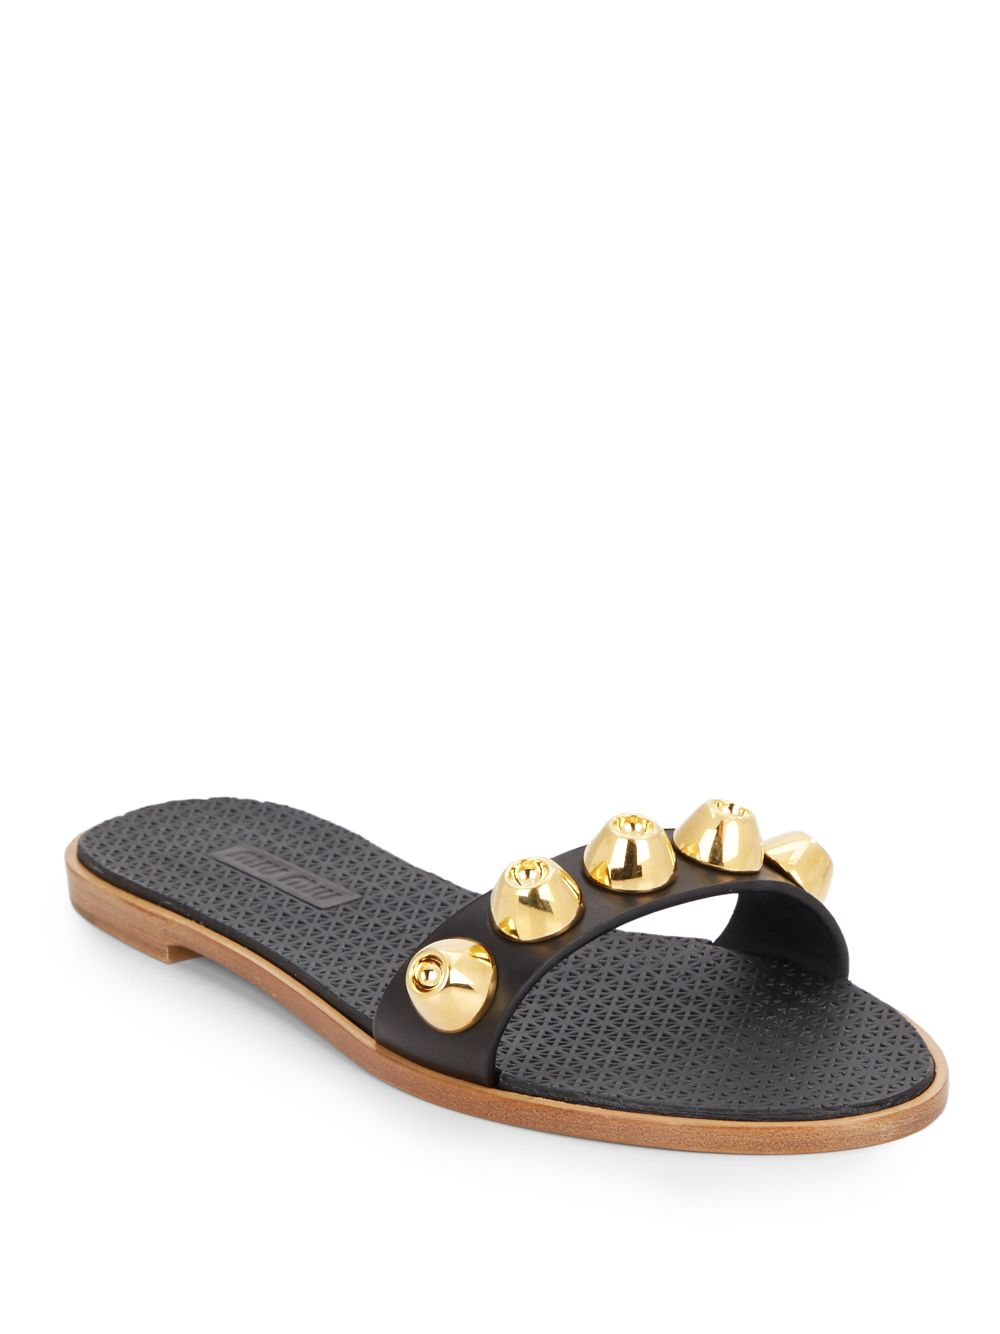 Miu Miu Leather Slide Sandals comfortable for sale WkLKN4bdC